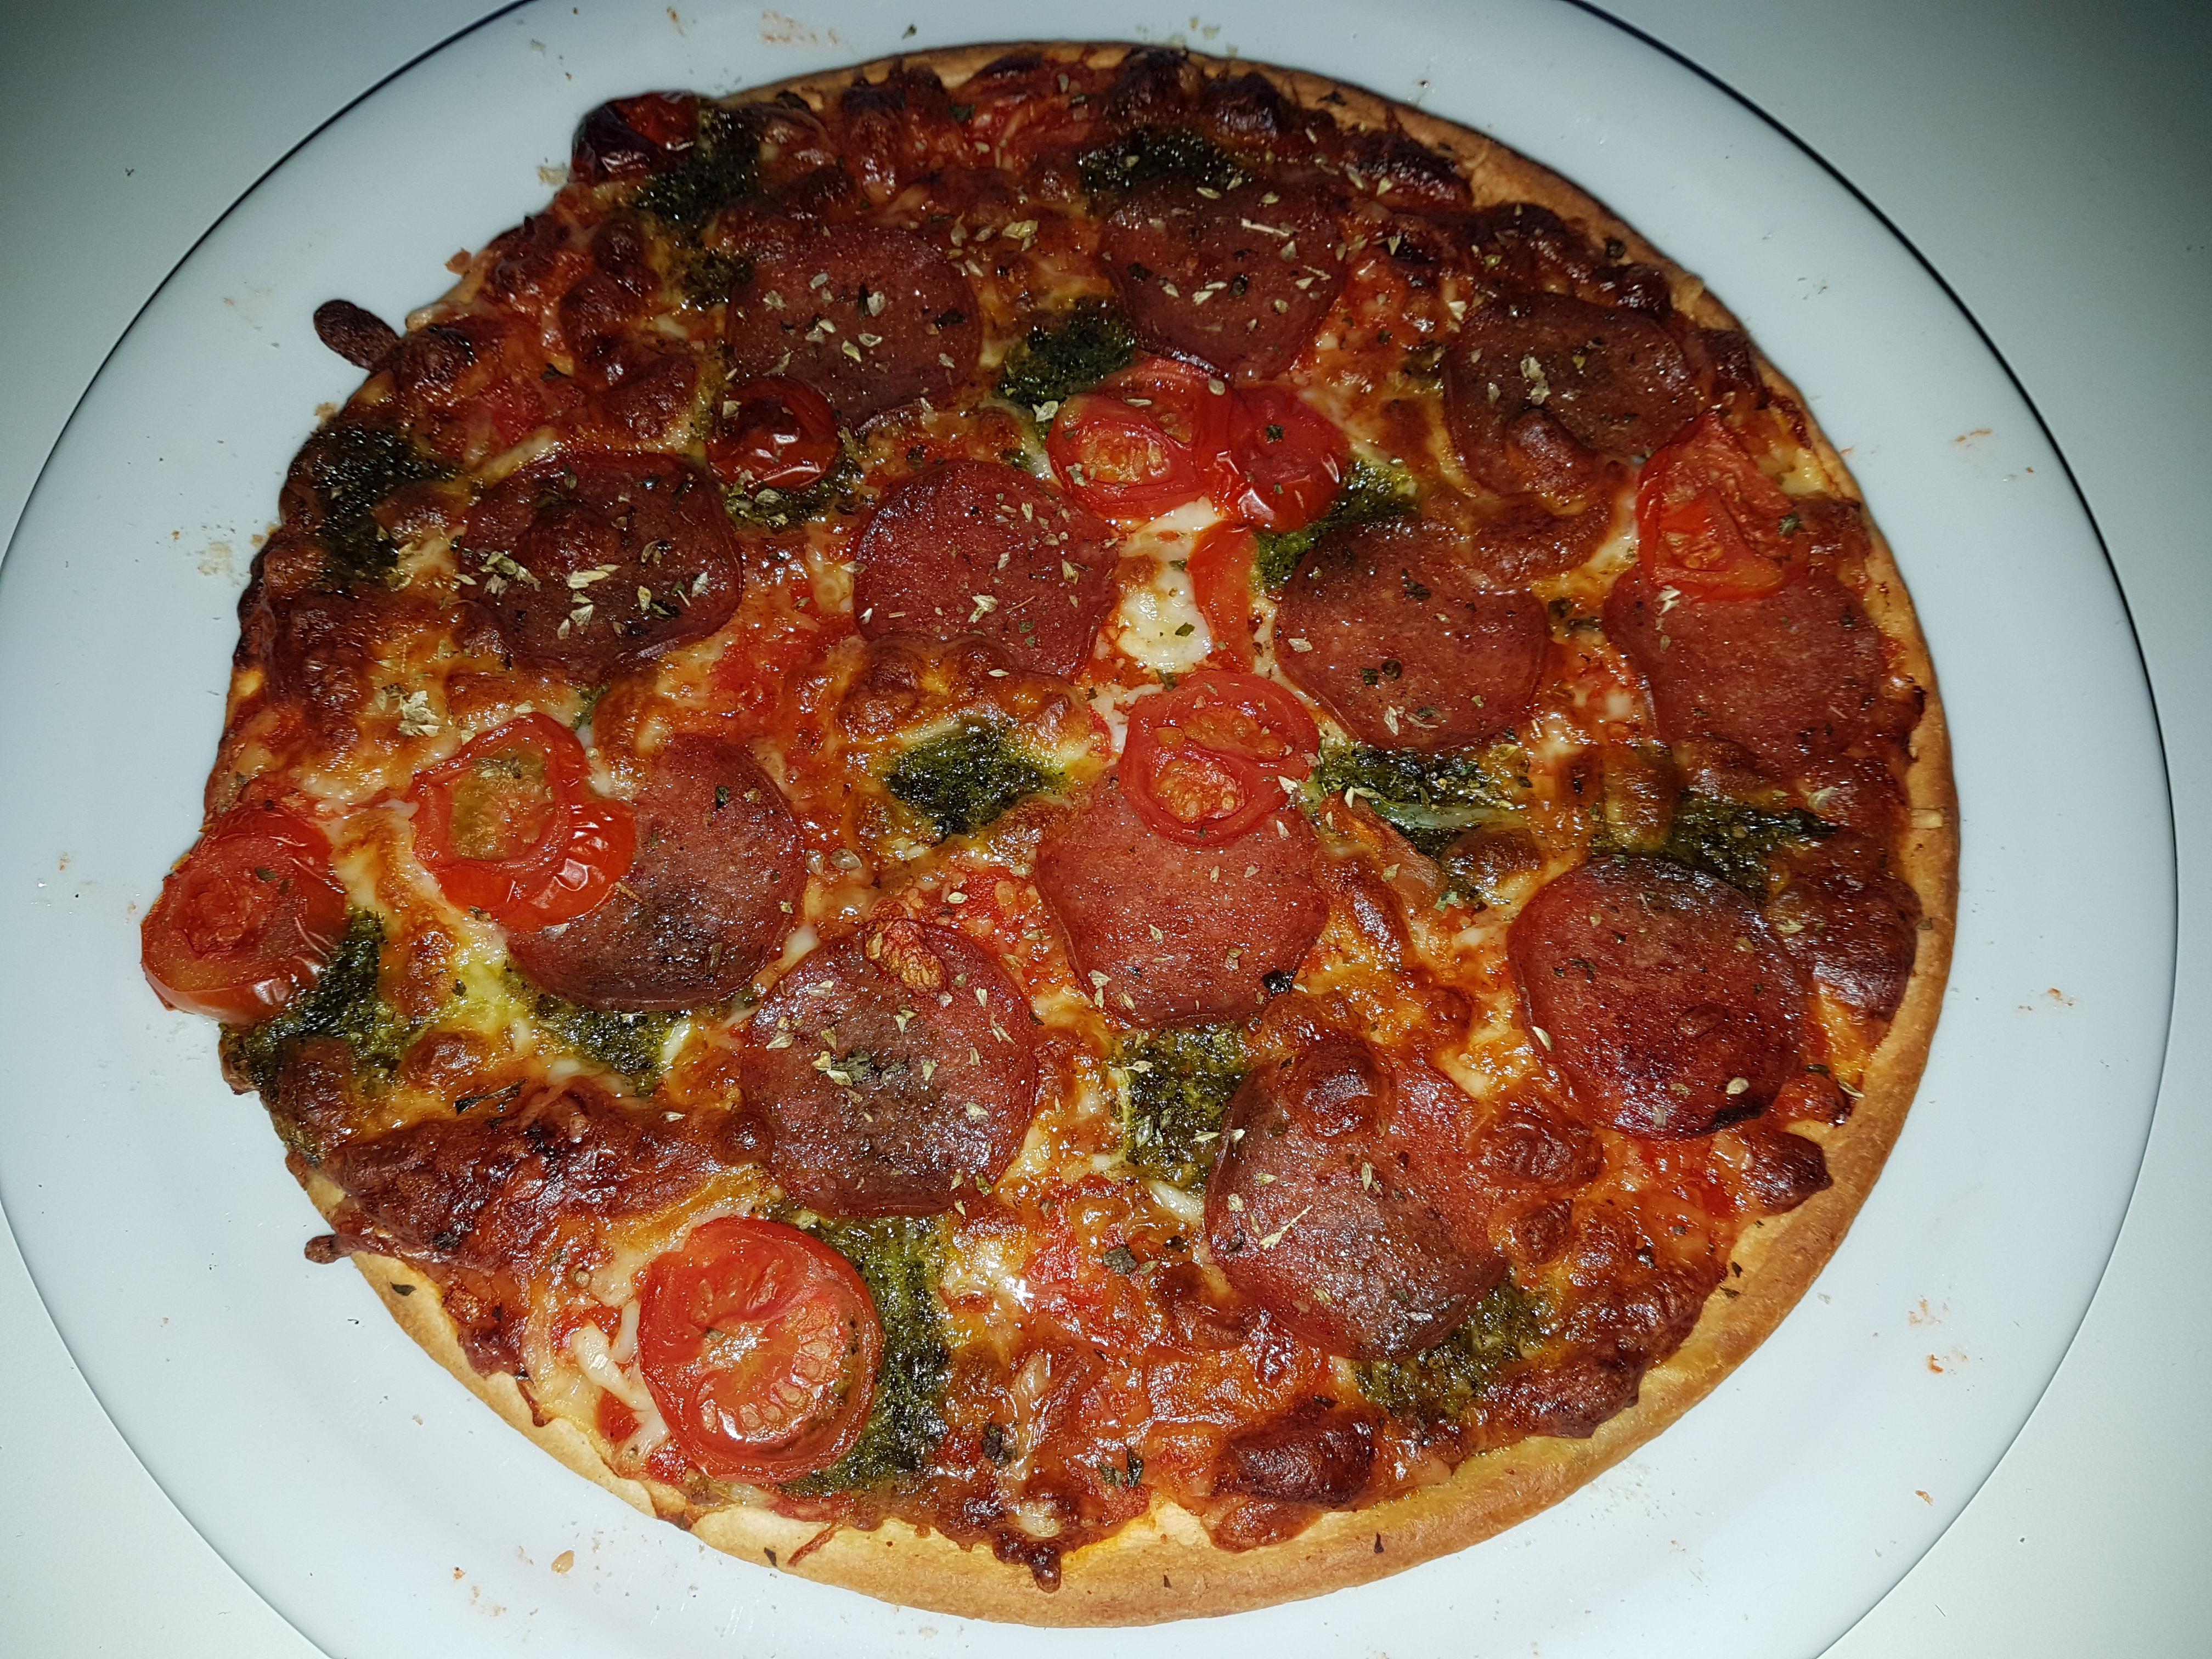 http://foodloader.net/Holz_2018-08-30_Pizza.jpg